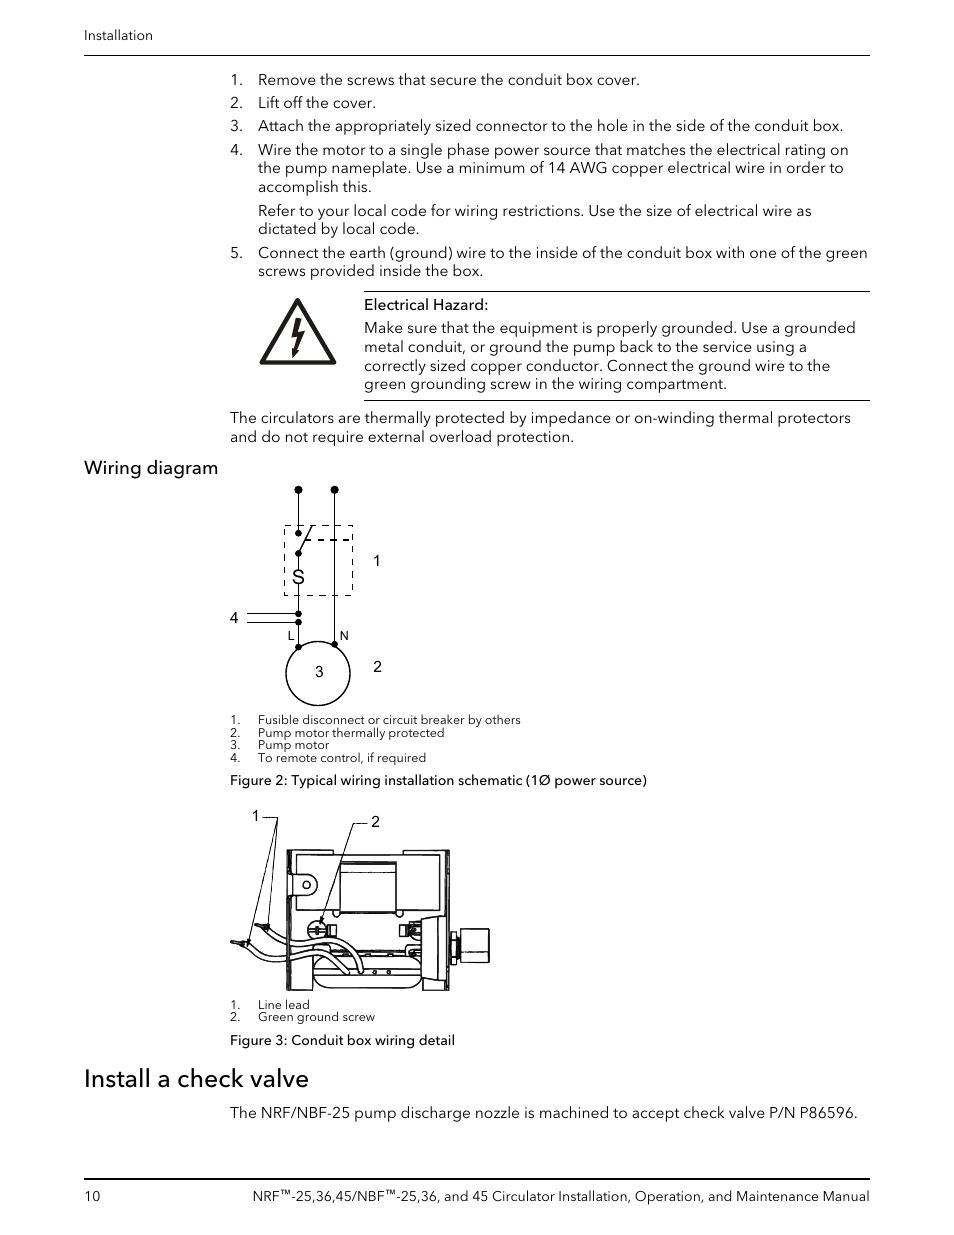 Wiring Diagram Install A Check Valve